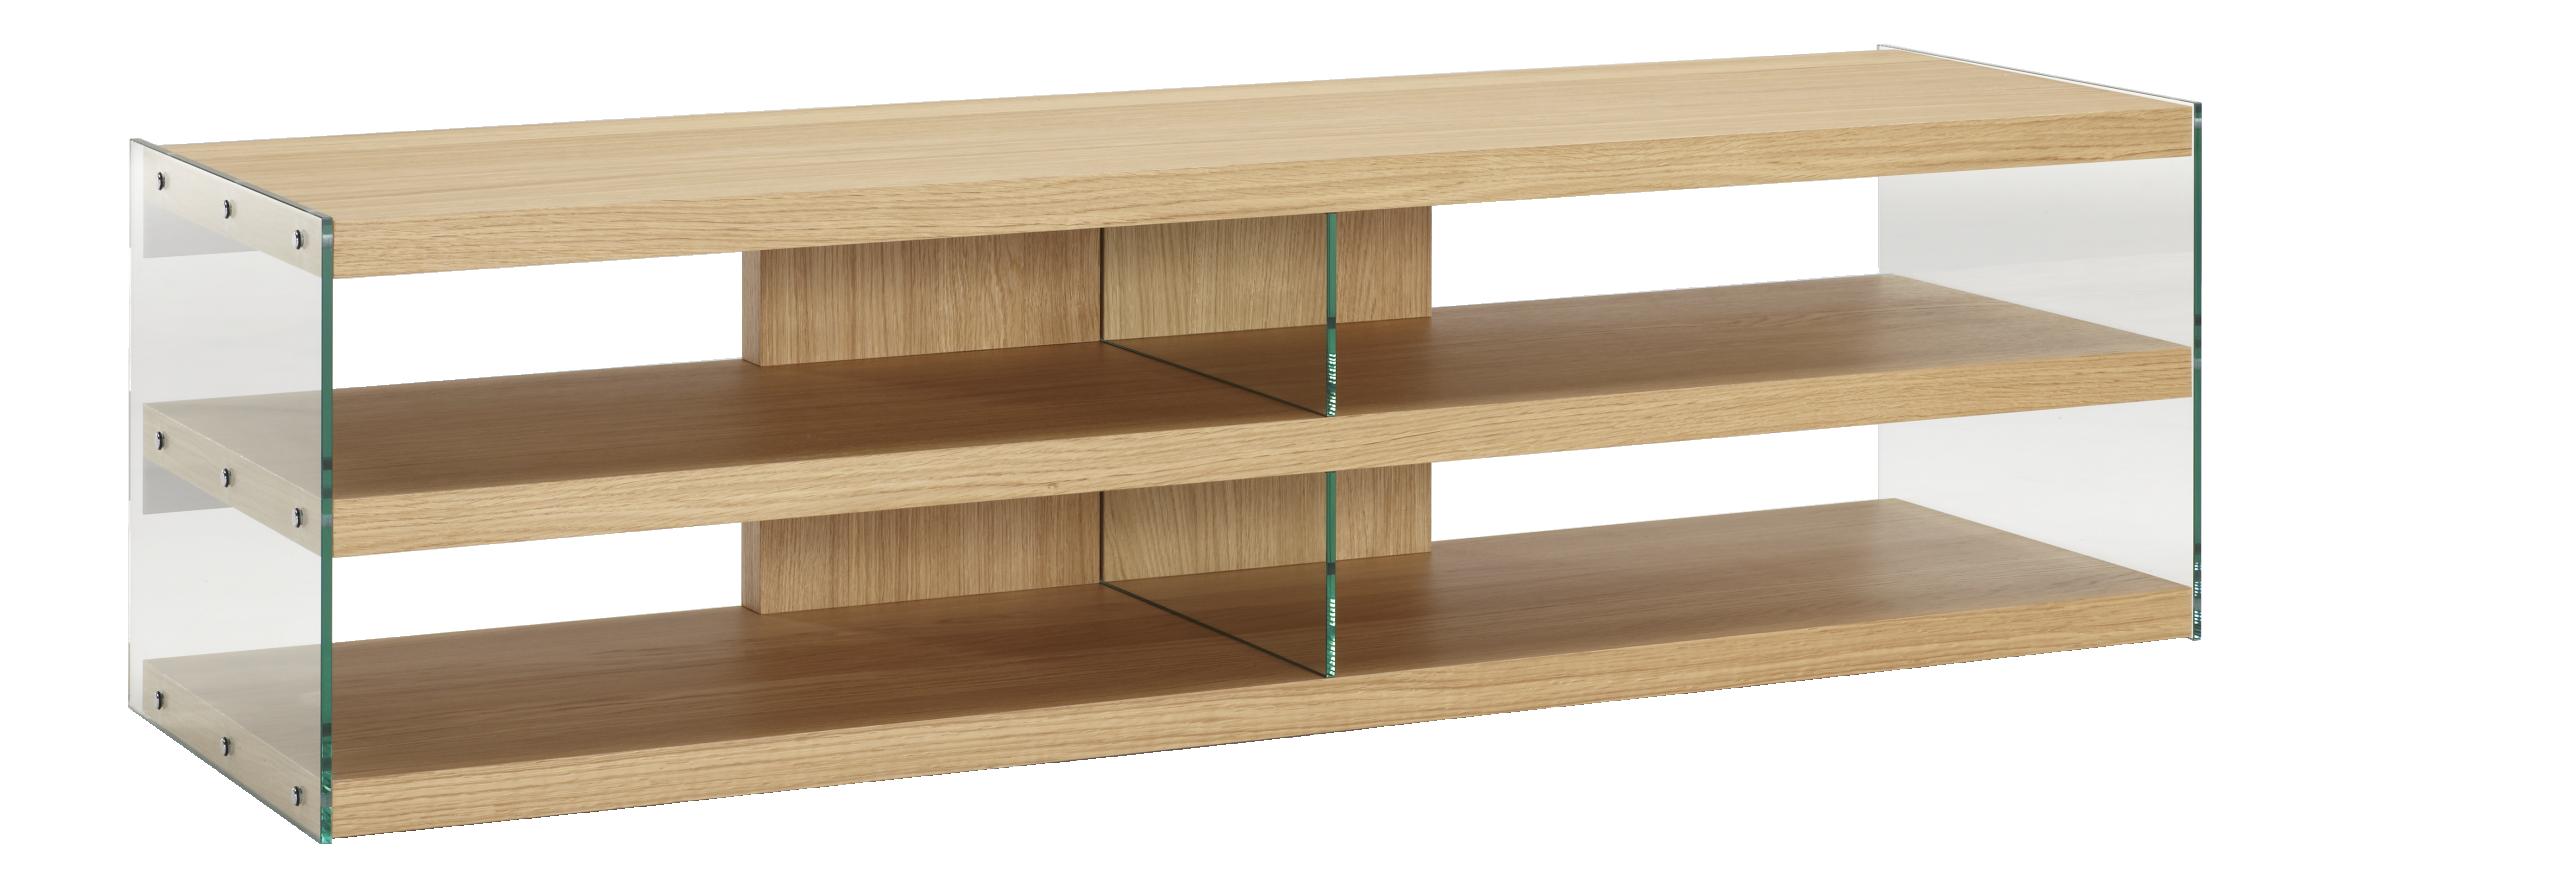 Elegance meuble audio video en 2020 meuble audio video Meuble tv habitat